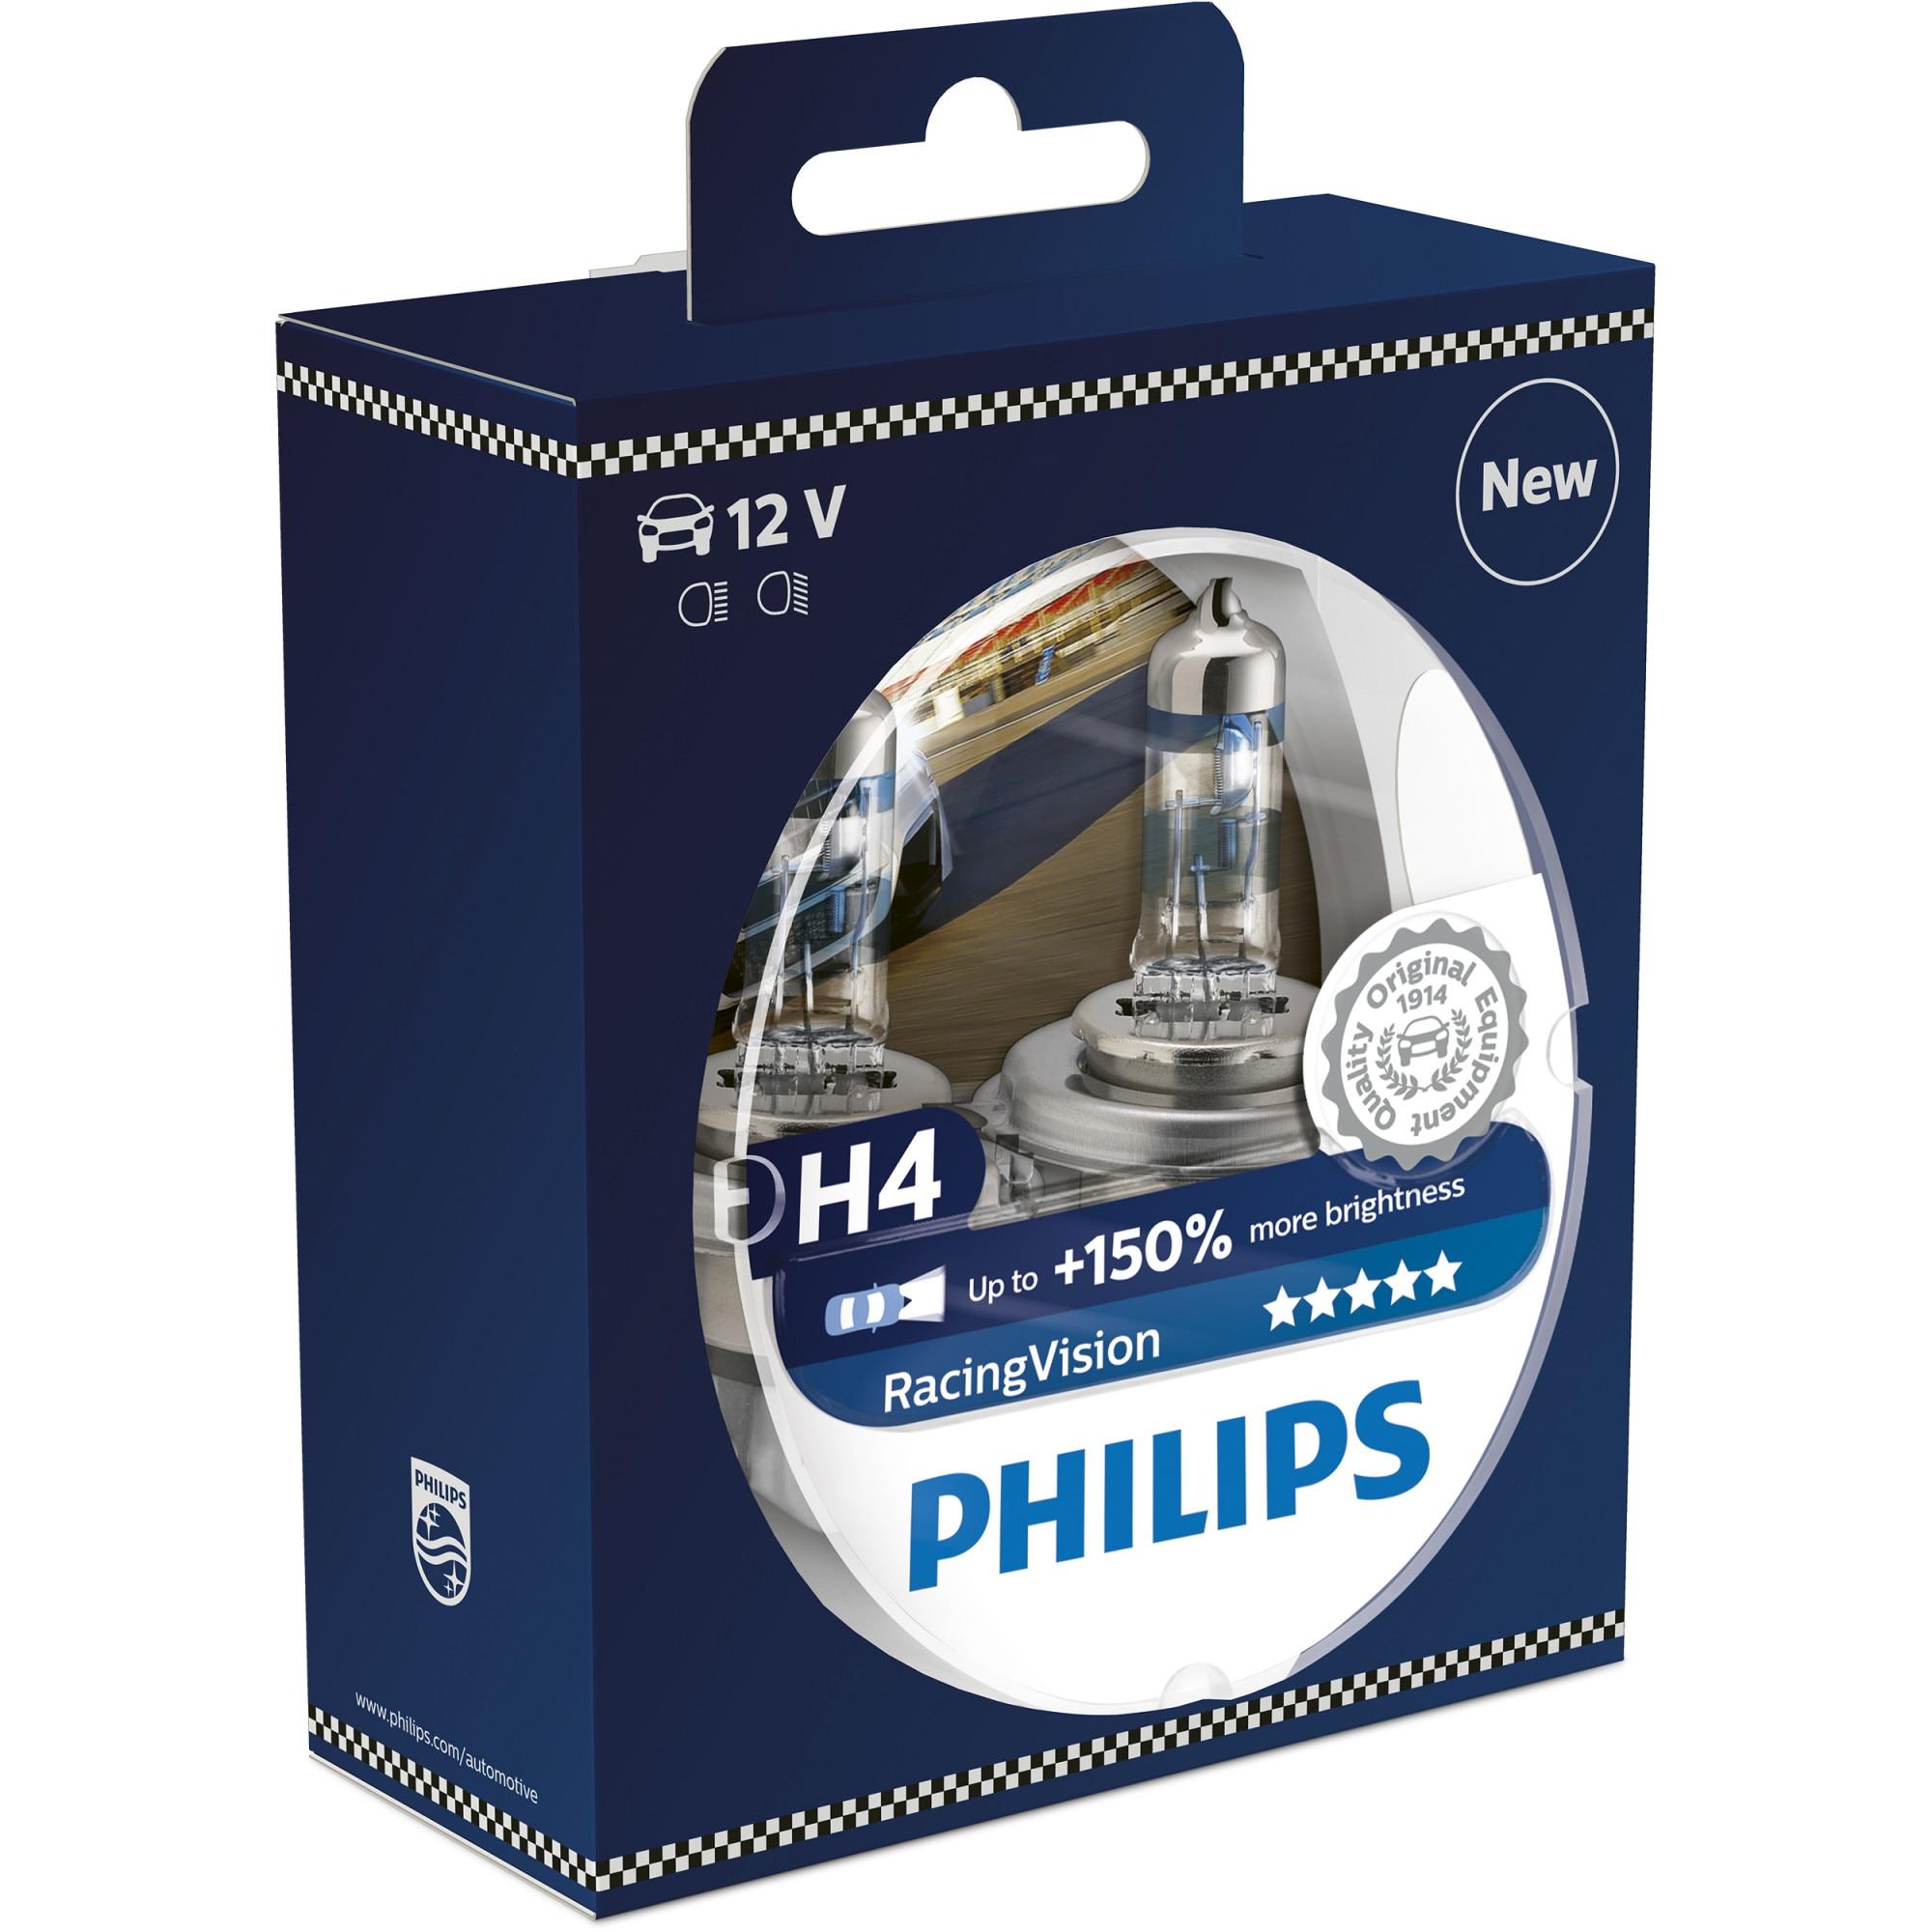 Fotografie Set 2 Becuri auto far halogen Philips H4 Philips Racing Vision, 150%, 12V 60/55W